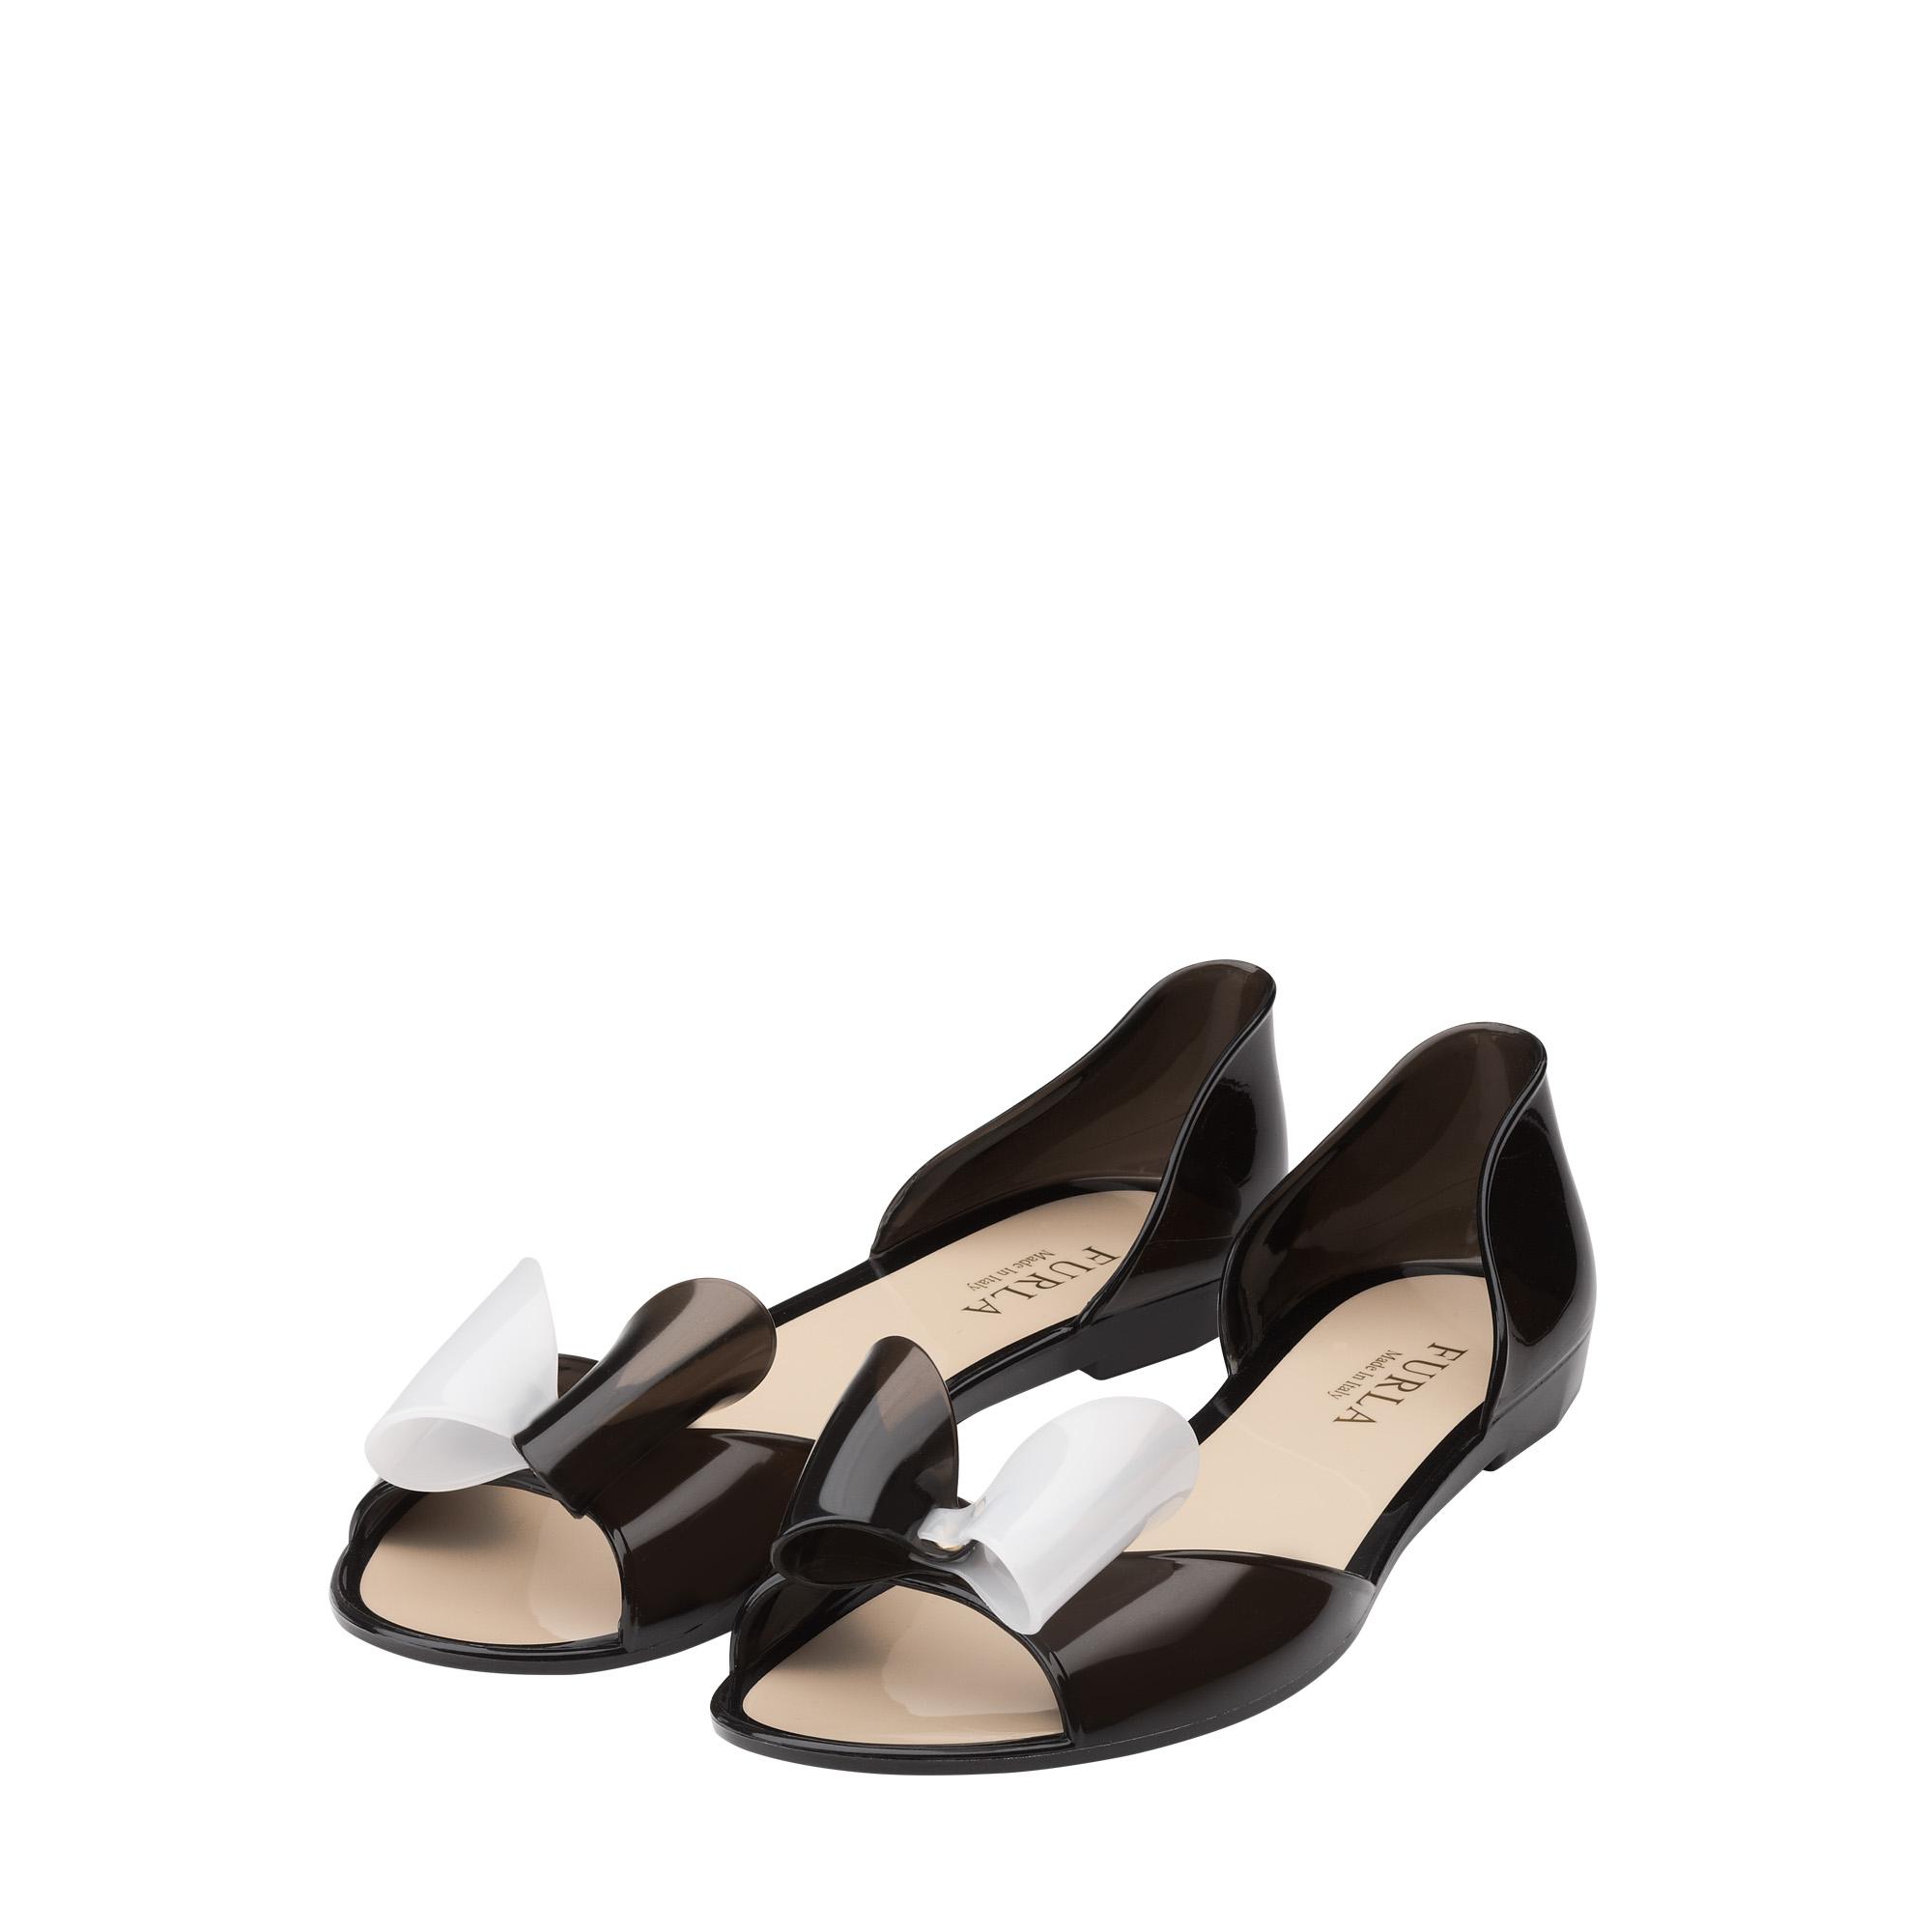 e9b757f66666 Furla Alissa Jelly Sandals in Black - Lyst